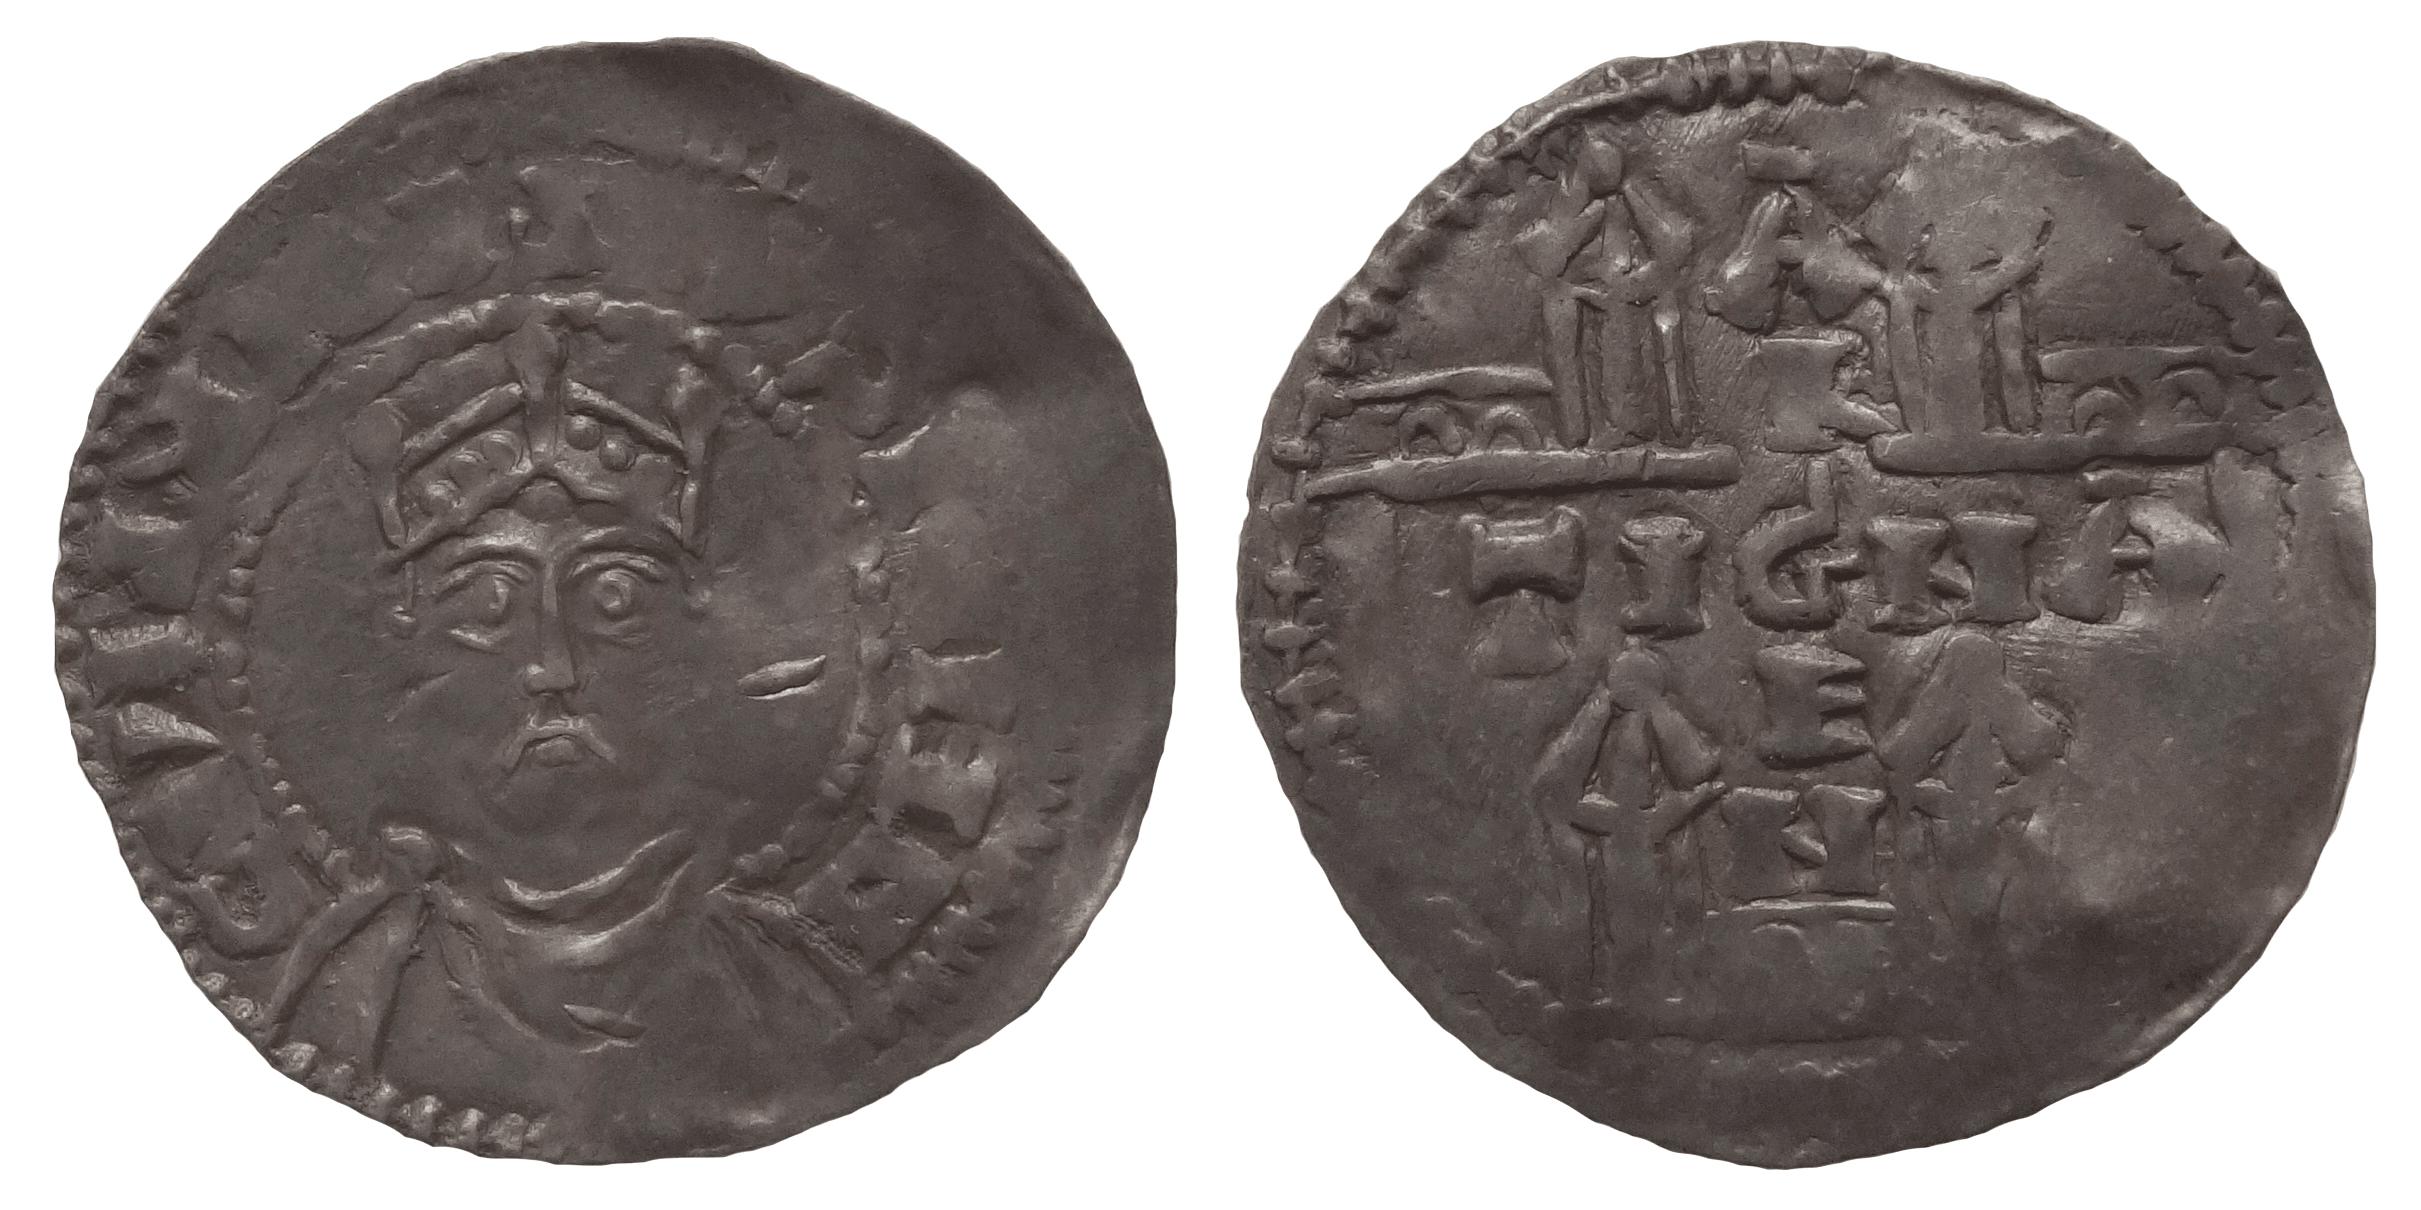 Германия, Страсбург. Конрад II (1024–1039, император с 1027). Денарий